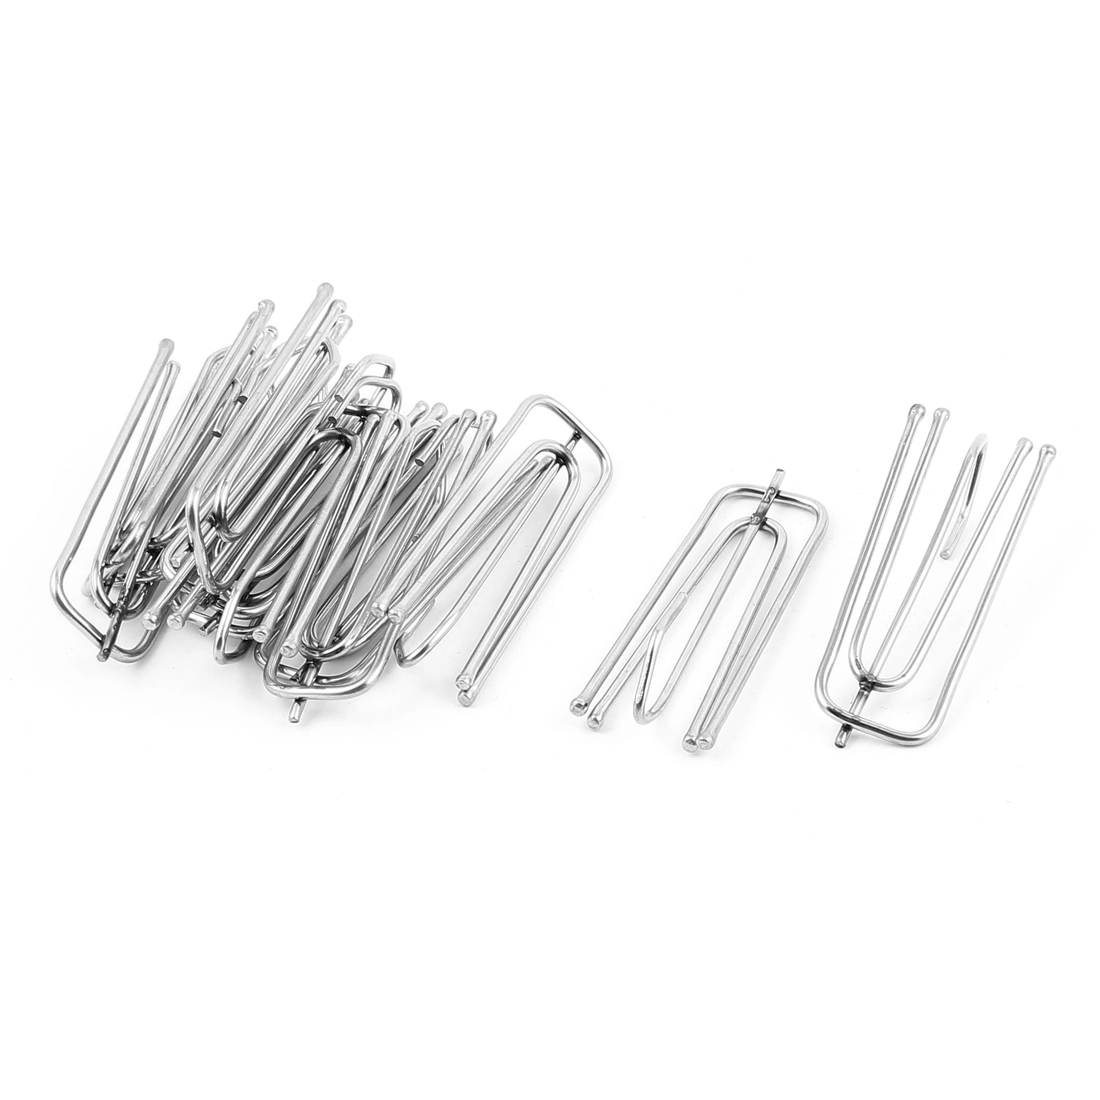 Window Treatment Curtains Drapes Hooks Pinch Pleat Prongs 12pcs Silver Tone